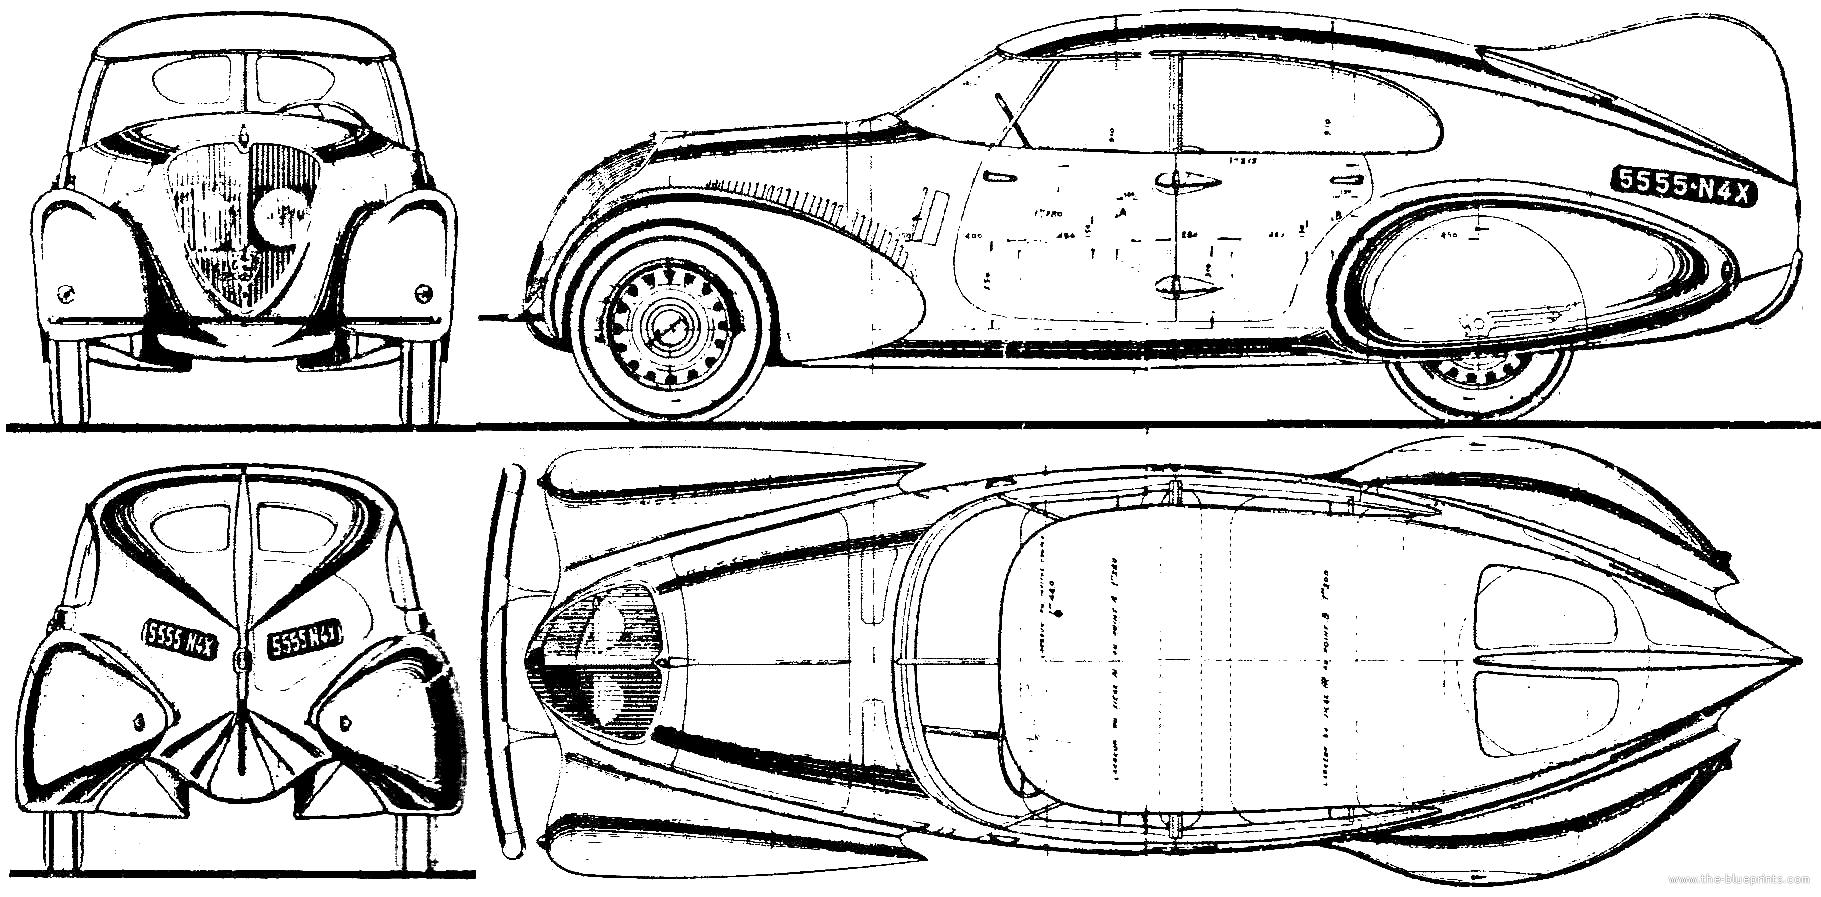 peugeot-402-n4x-1937.png